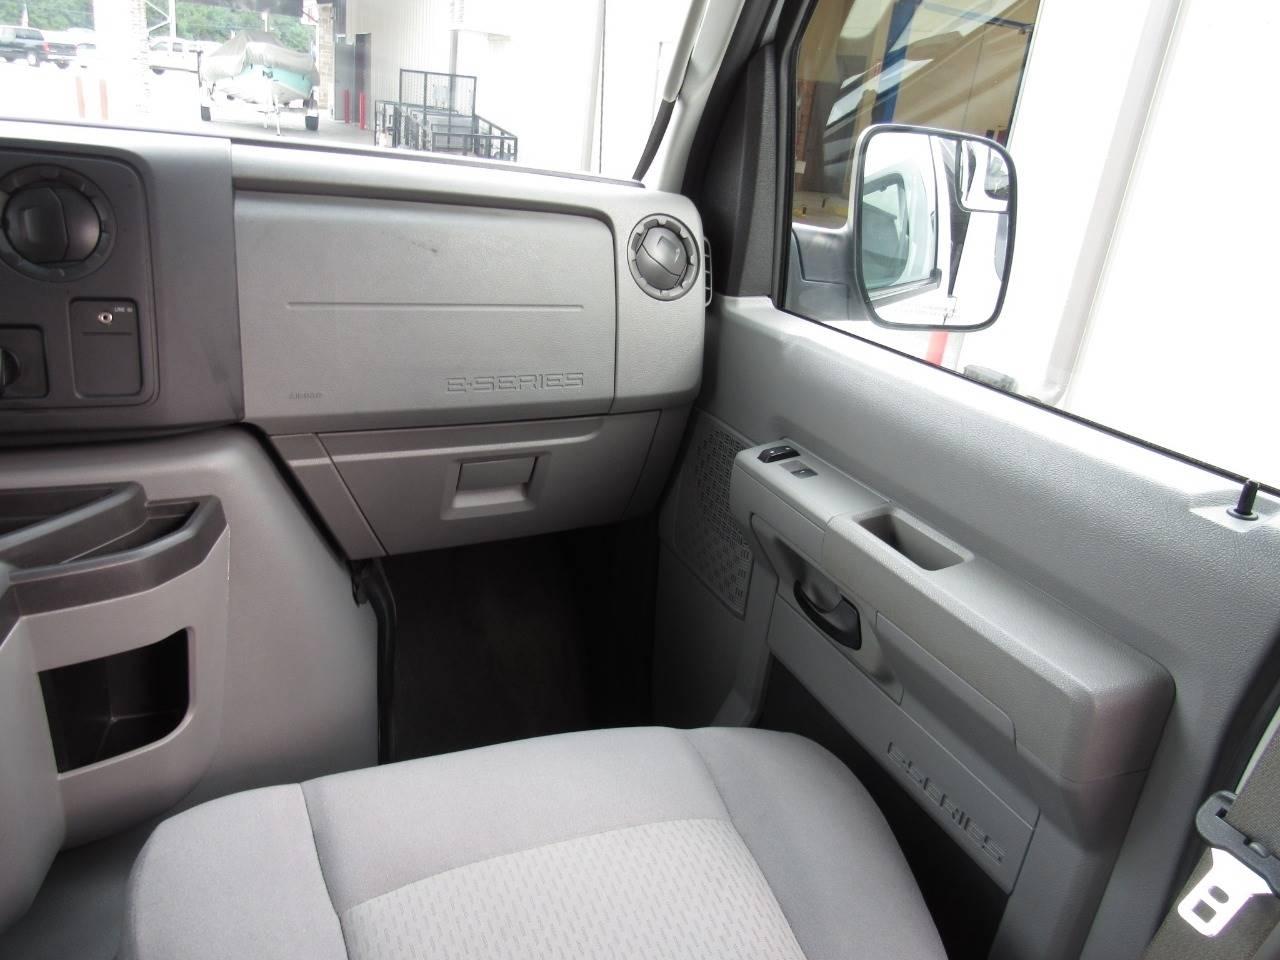 2012 Ford E-Series Wagon